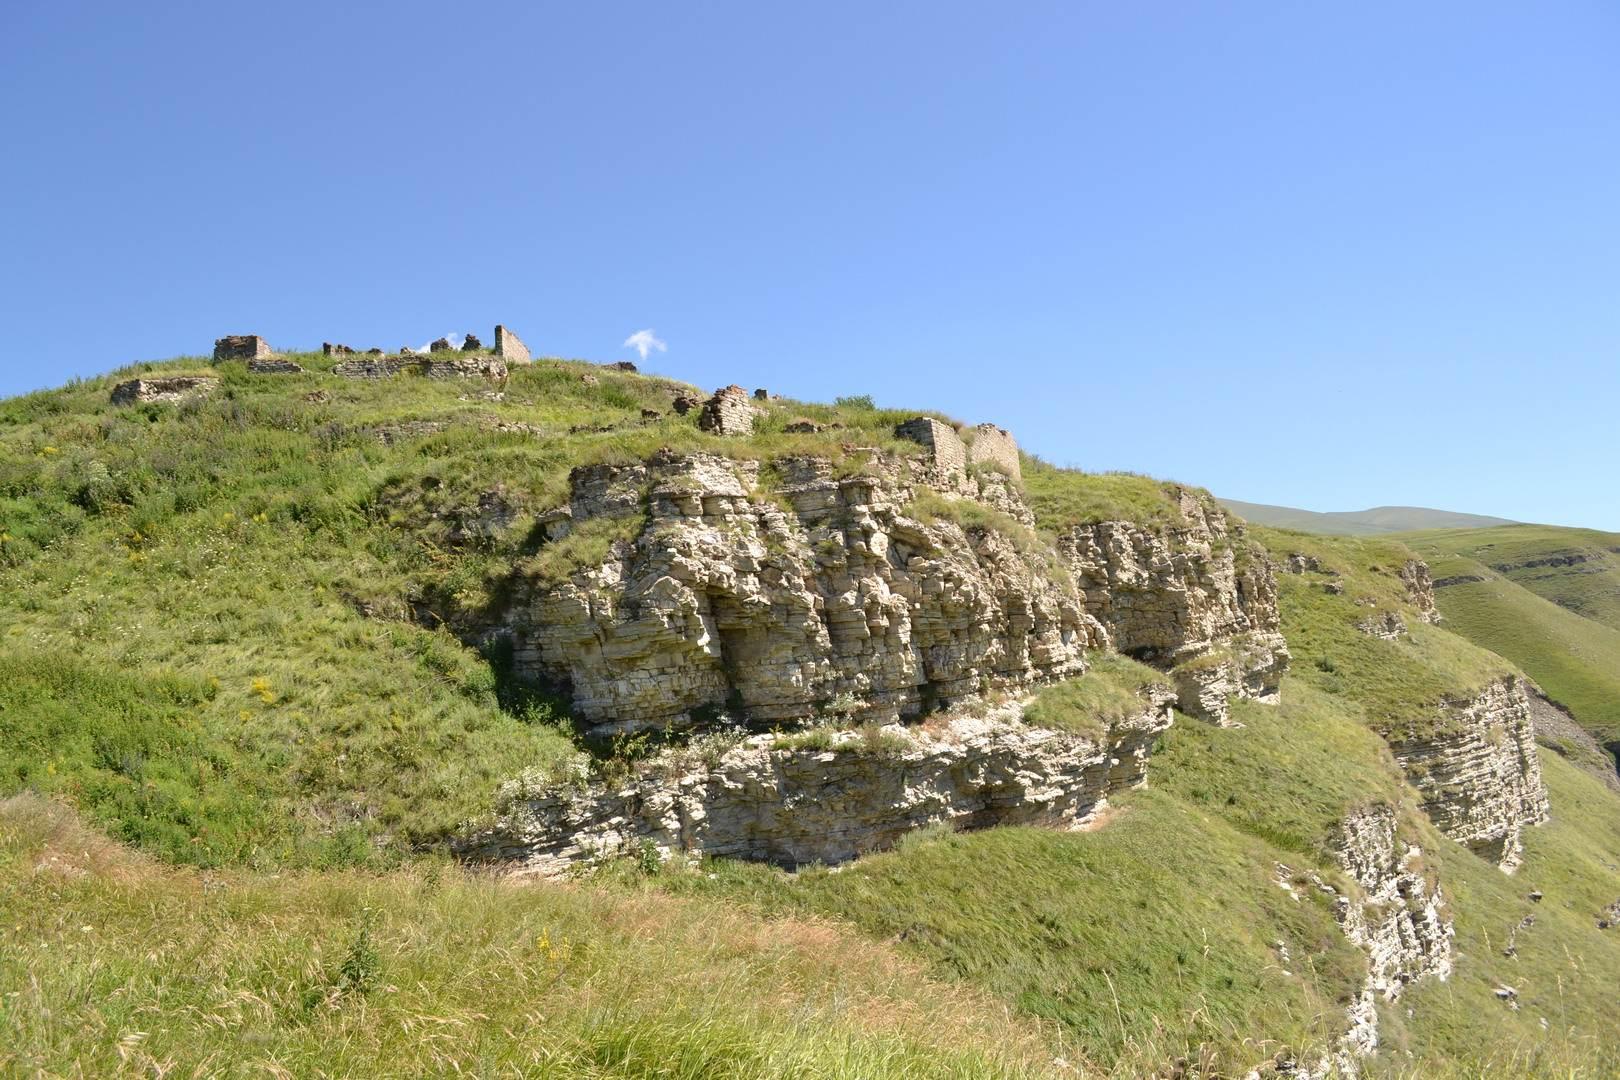 замок горцев на склоне, руины, чечня, горы кавказа